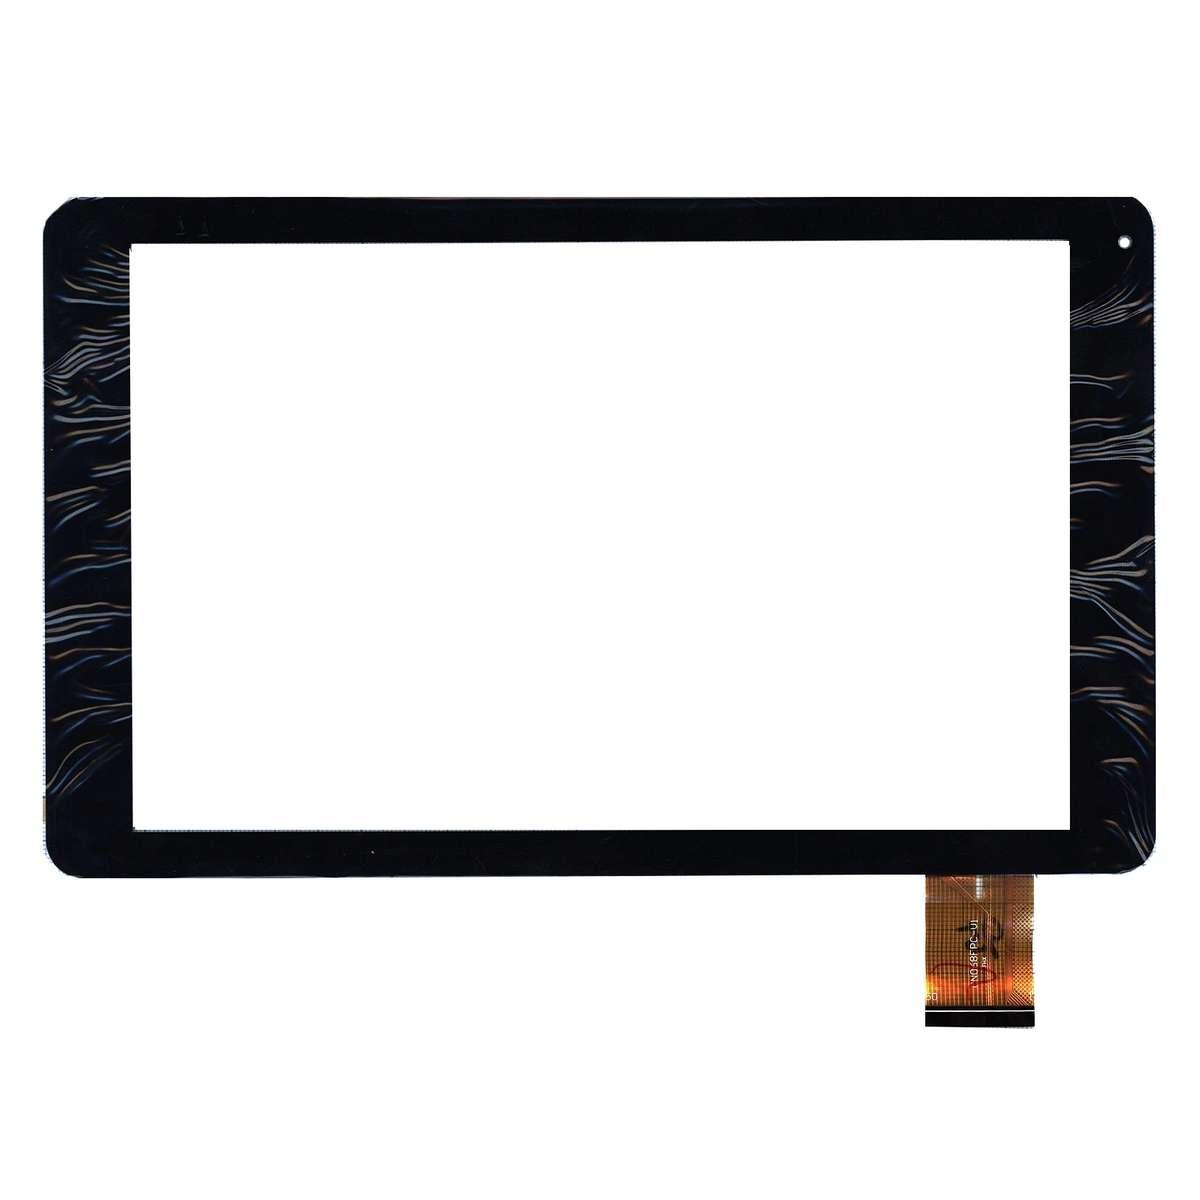 Touchscreen Digitizer Lark Evolution X4 10.1 3G IPS Geam Sticla Tableta imagine powerlaptop.ro 2021